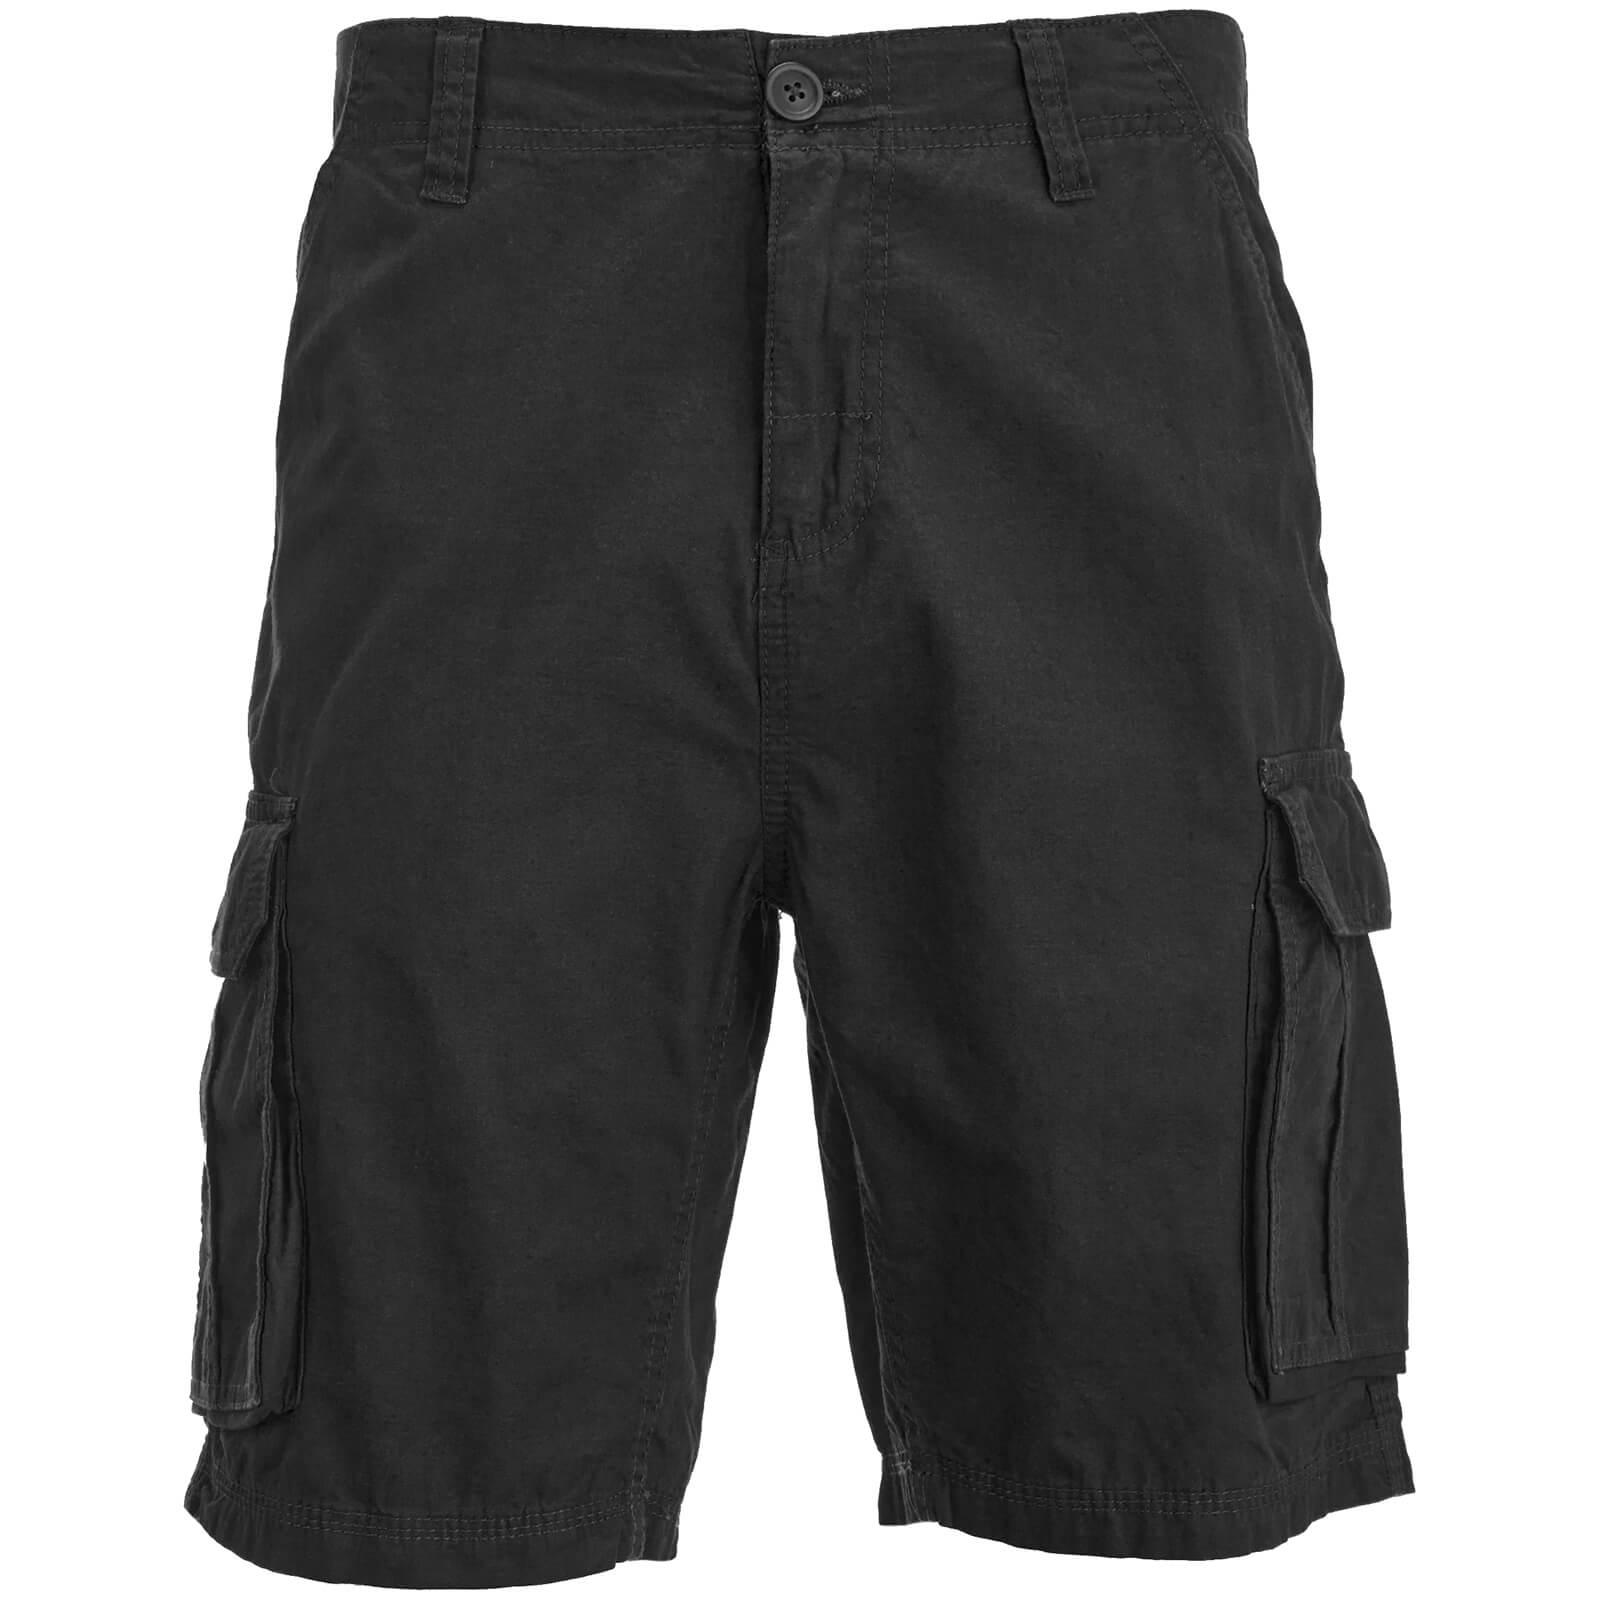 Brave Soul Men's Riverwood Cargo Shorts - Black talla S